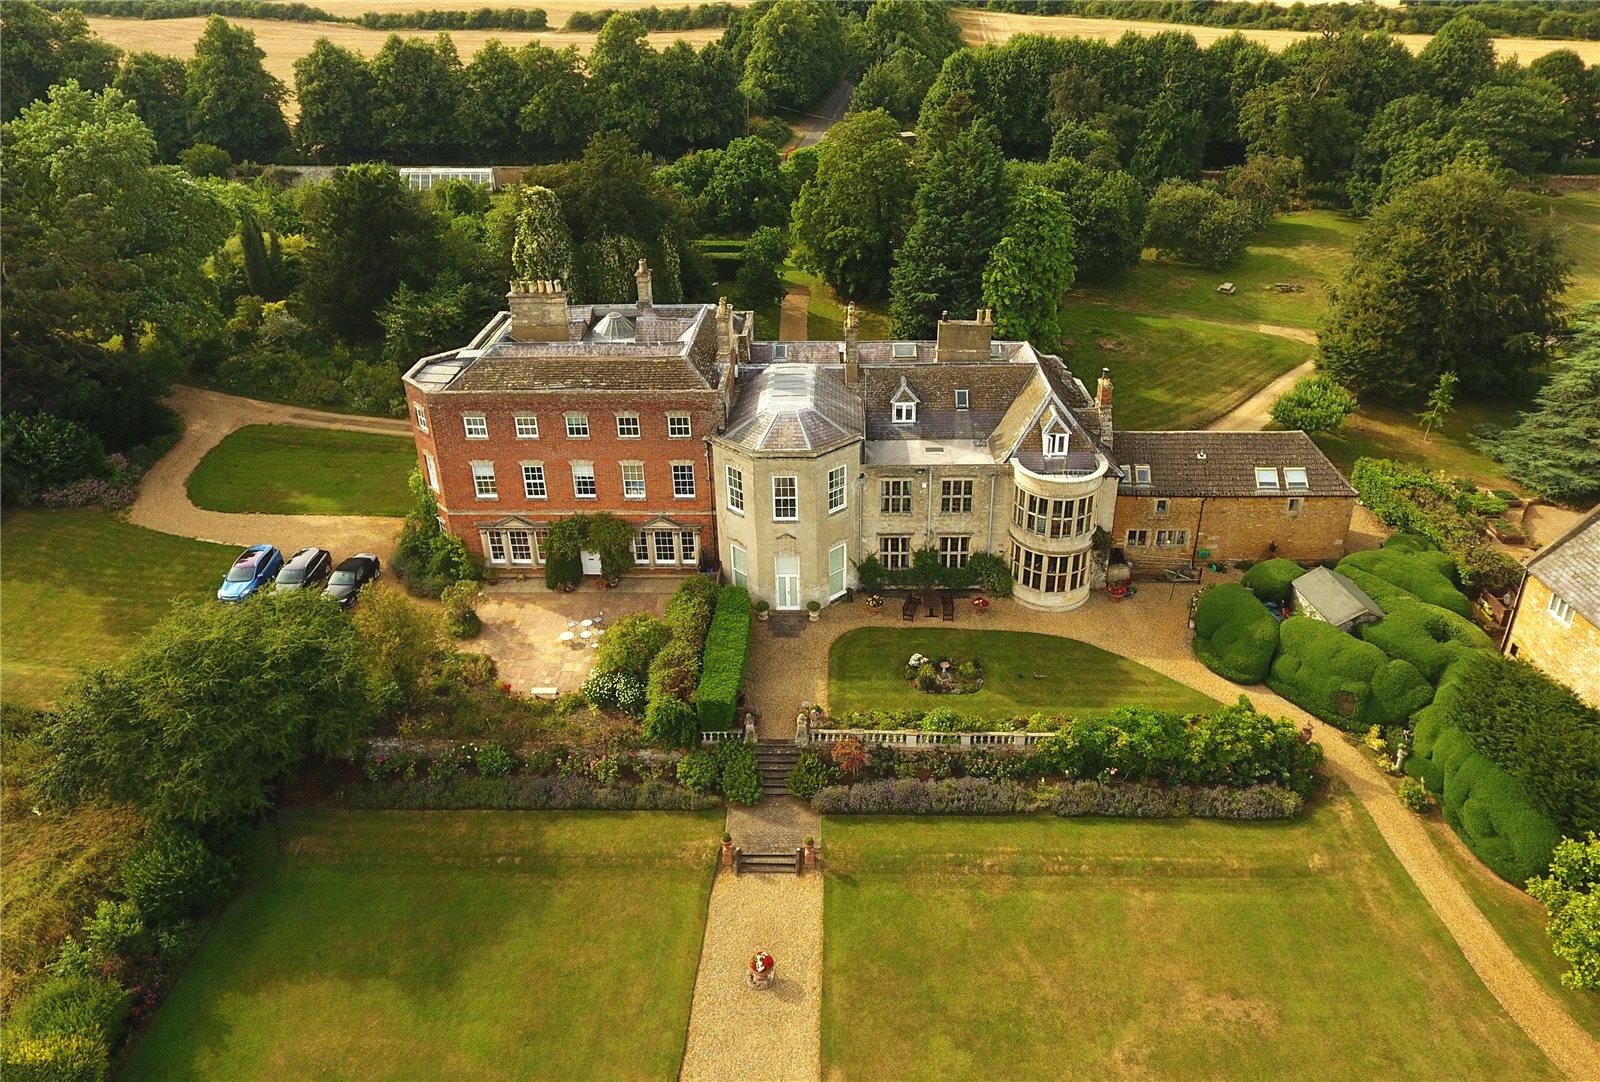 Maison unifamiliale pour l Vente à Glendon Hall, Glendon, Kettering, Northamptonshire, NN14 Kettering, Angleterre